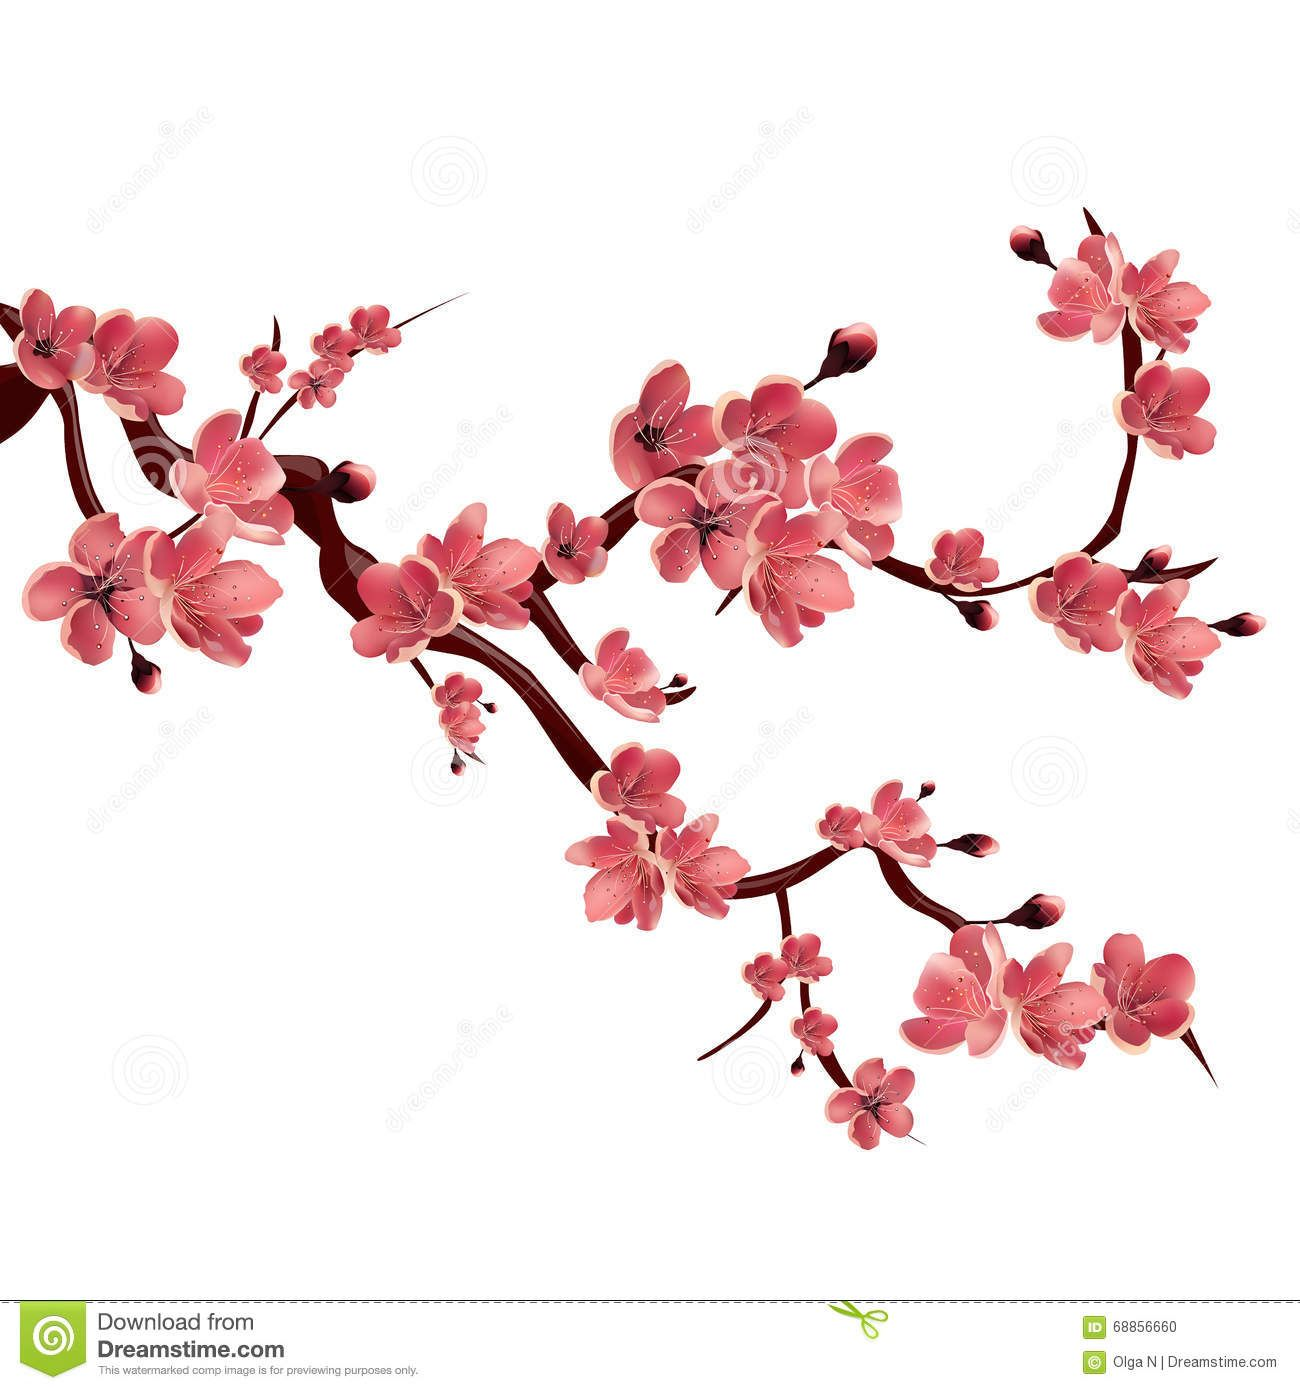 Znalezione Obrazy Dla Zapytania Sakura Cherry Blossom Art Japanese Cherry Tree Blossom Tree Tattoo